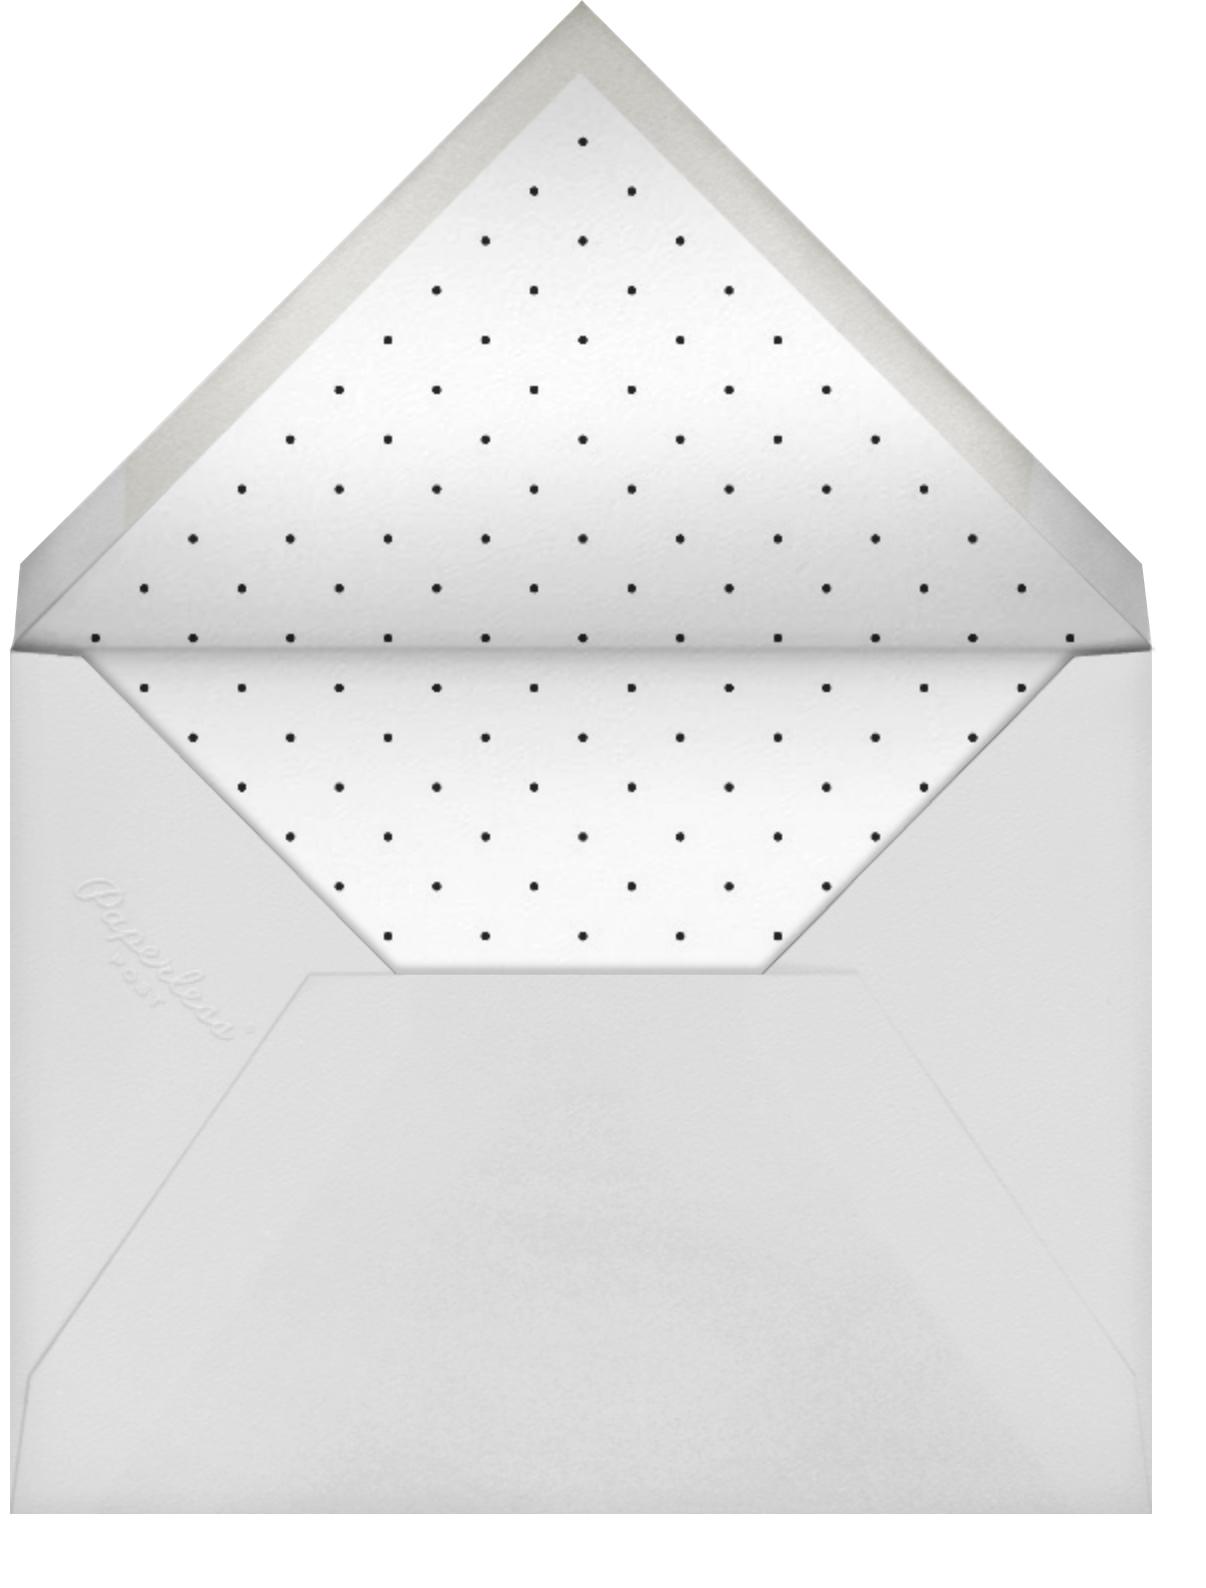 Costa Smeralda - Blind Emboss - Paperless Post - null - envelope back